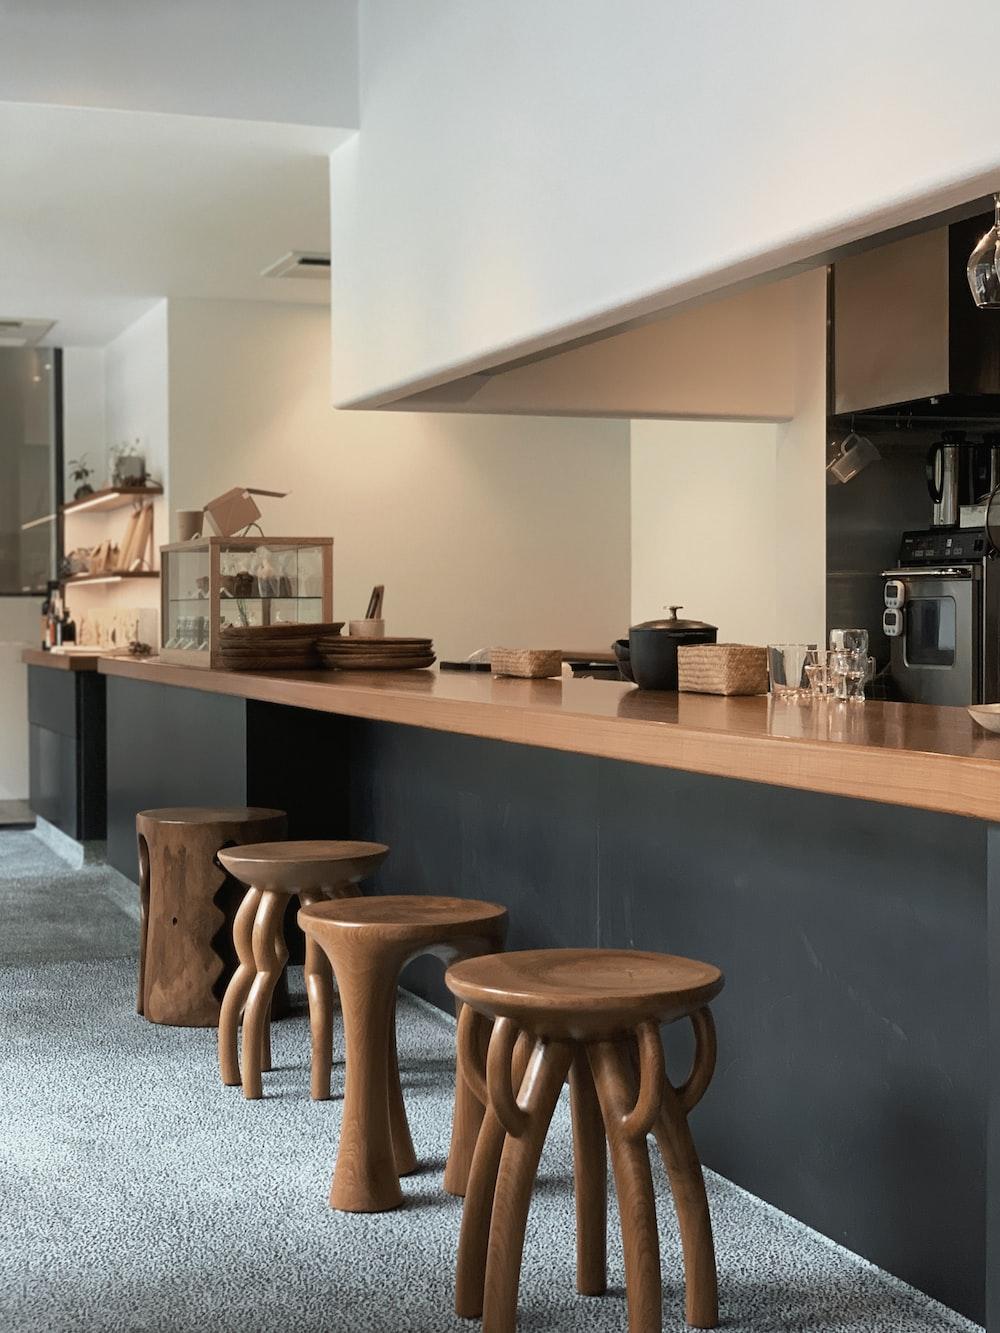 empty brown wooden stools